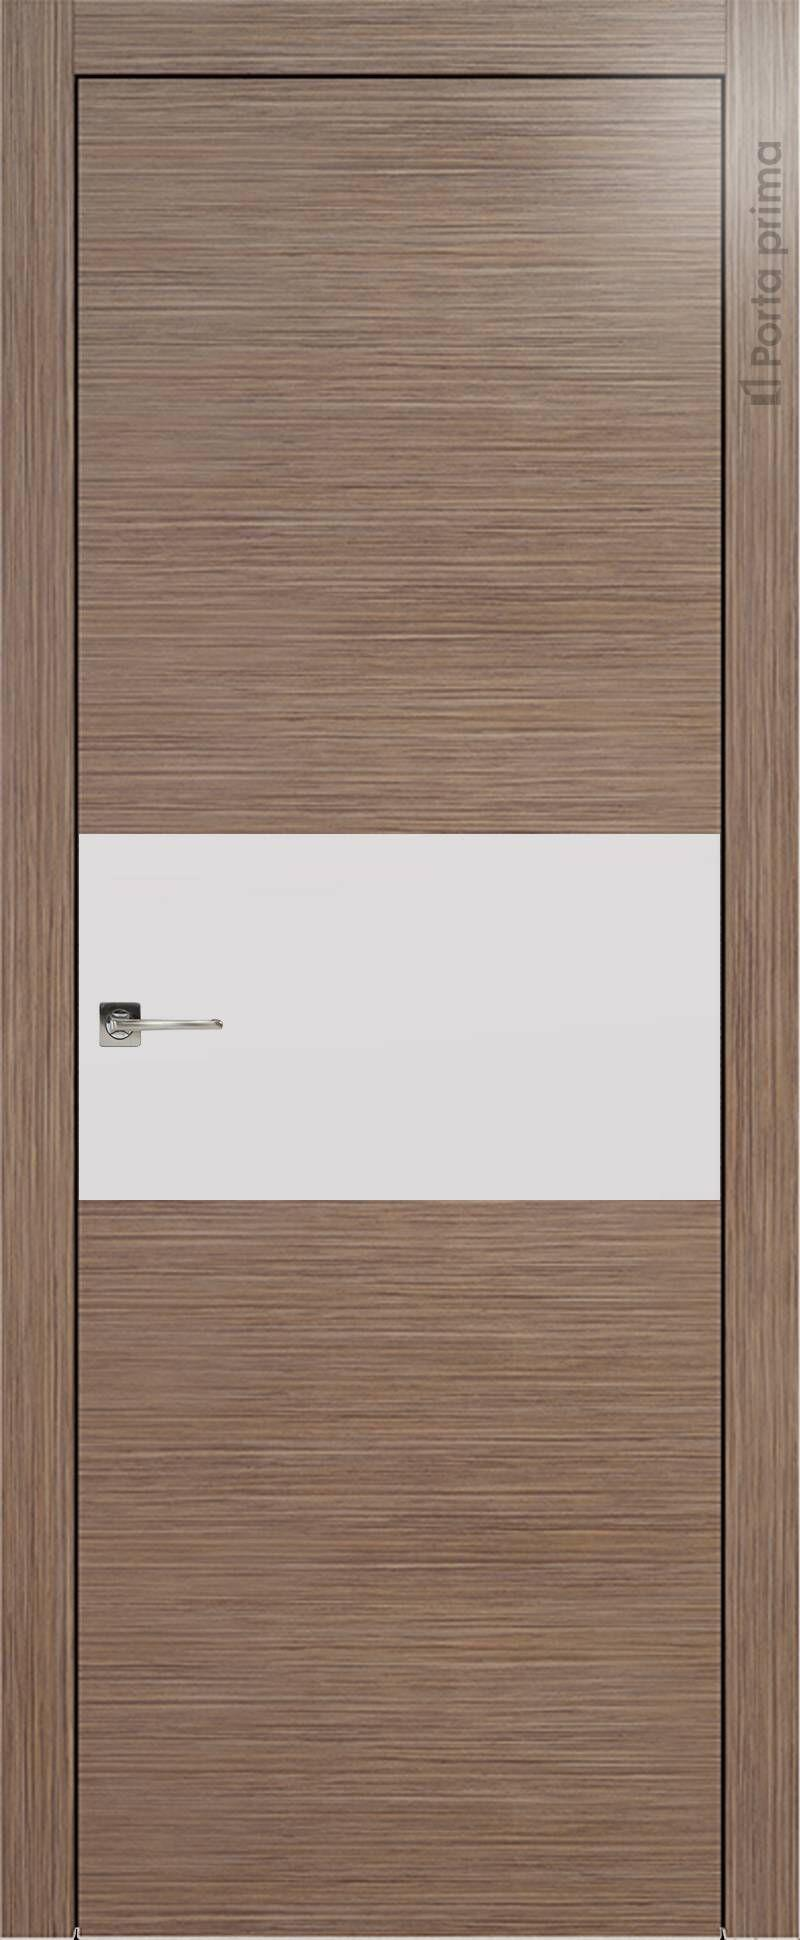 Tivoli Е-4 цвет - Орех Без стекла (ДГ)